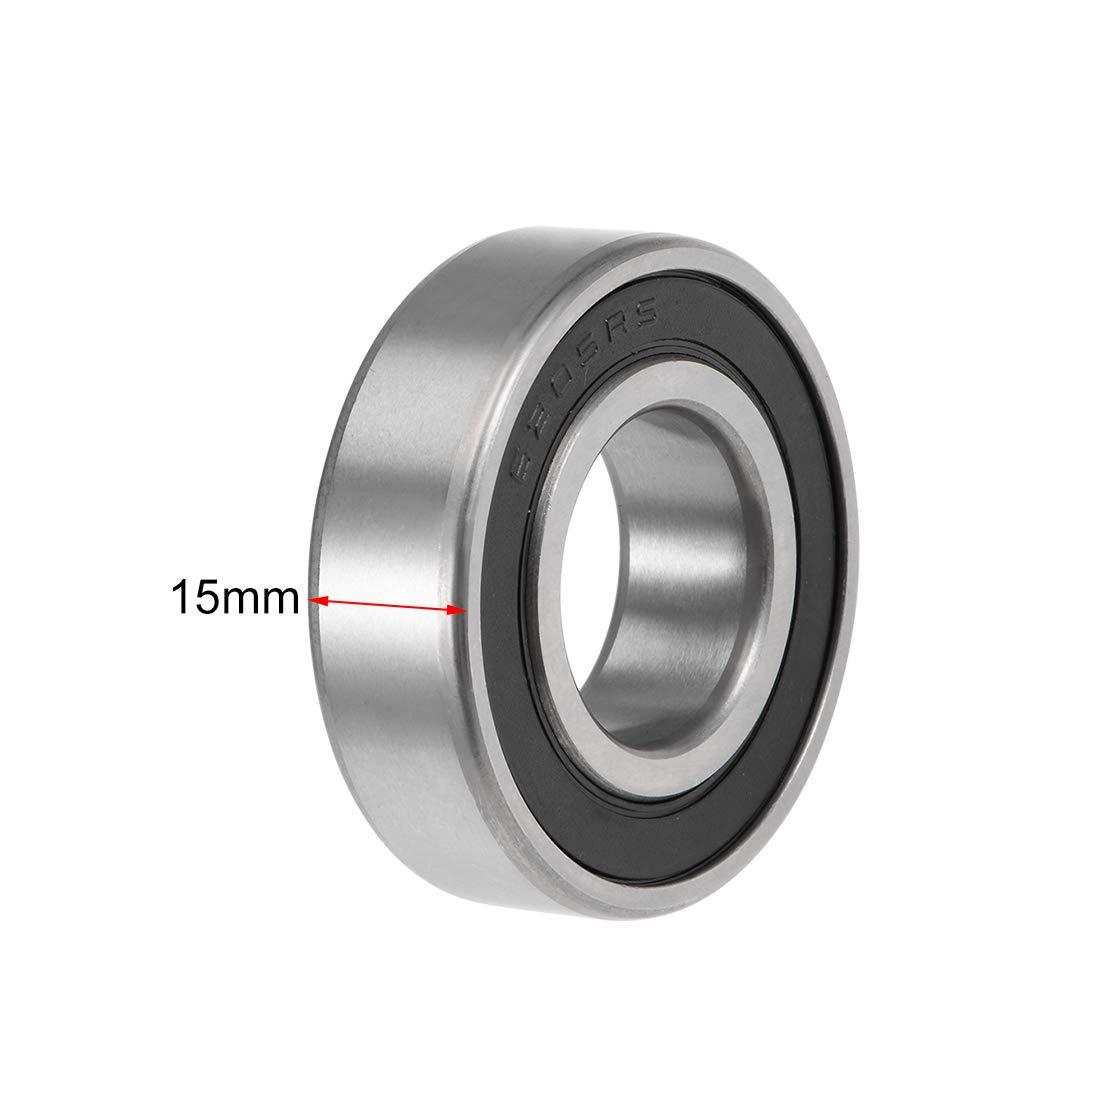 2PCS 6205-2RS Deep Groove Ball Bearing 25mm*52mm*15mm